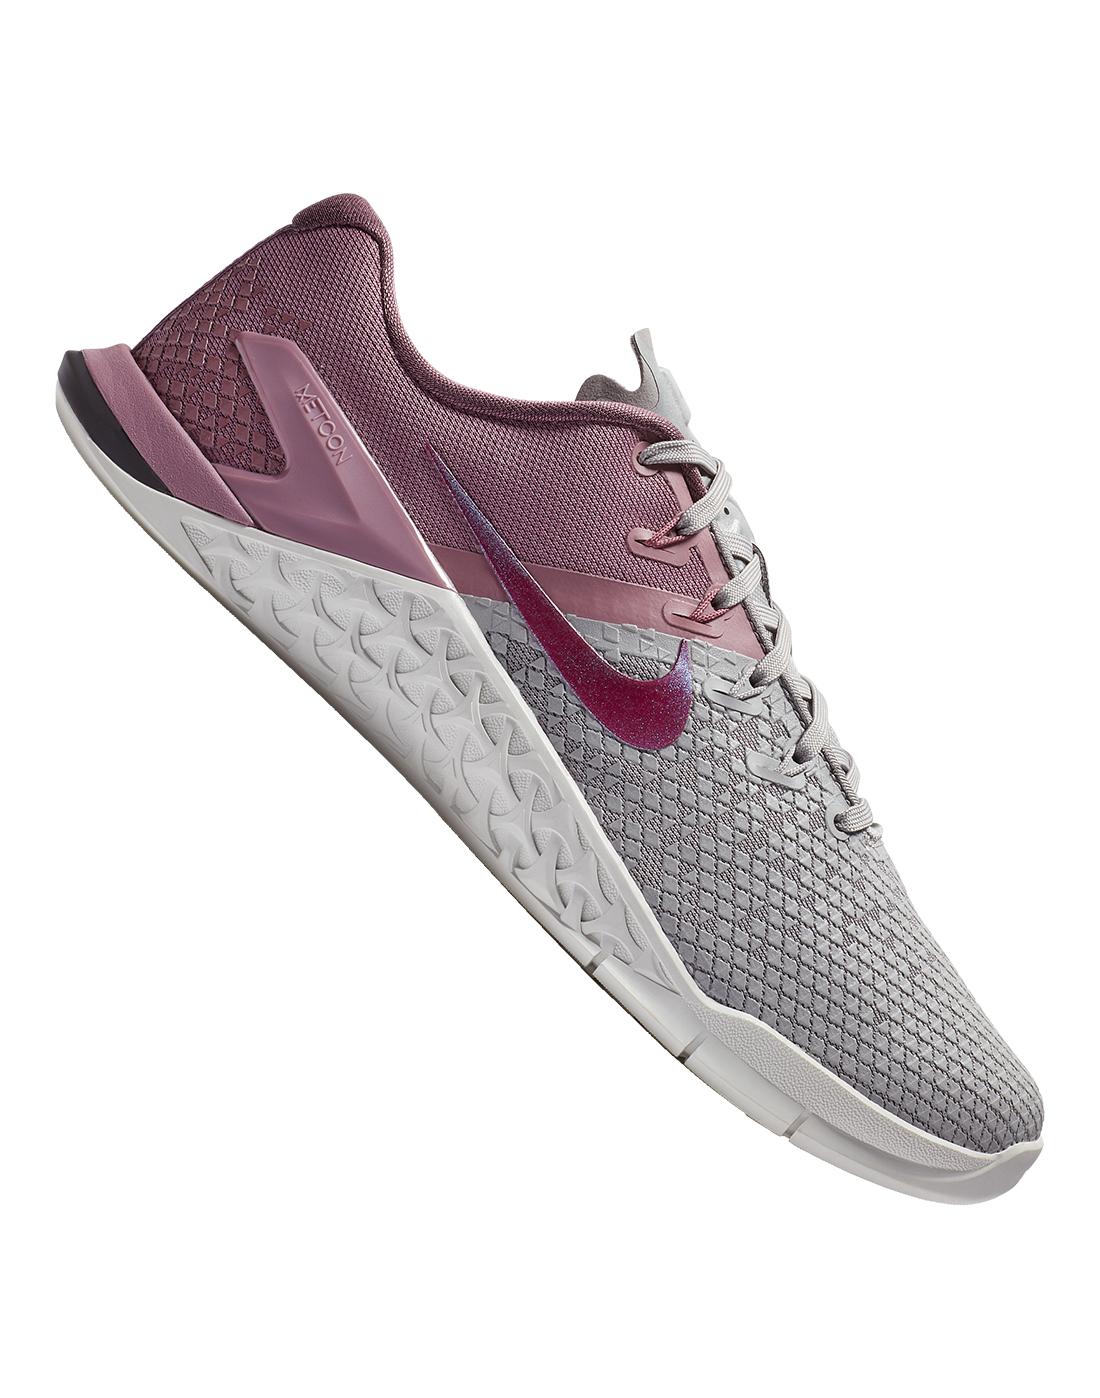 9a52b21c17df8 Women s Pink Nike Metcon 4